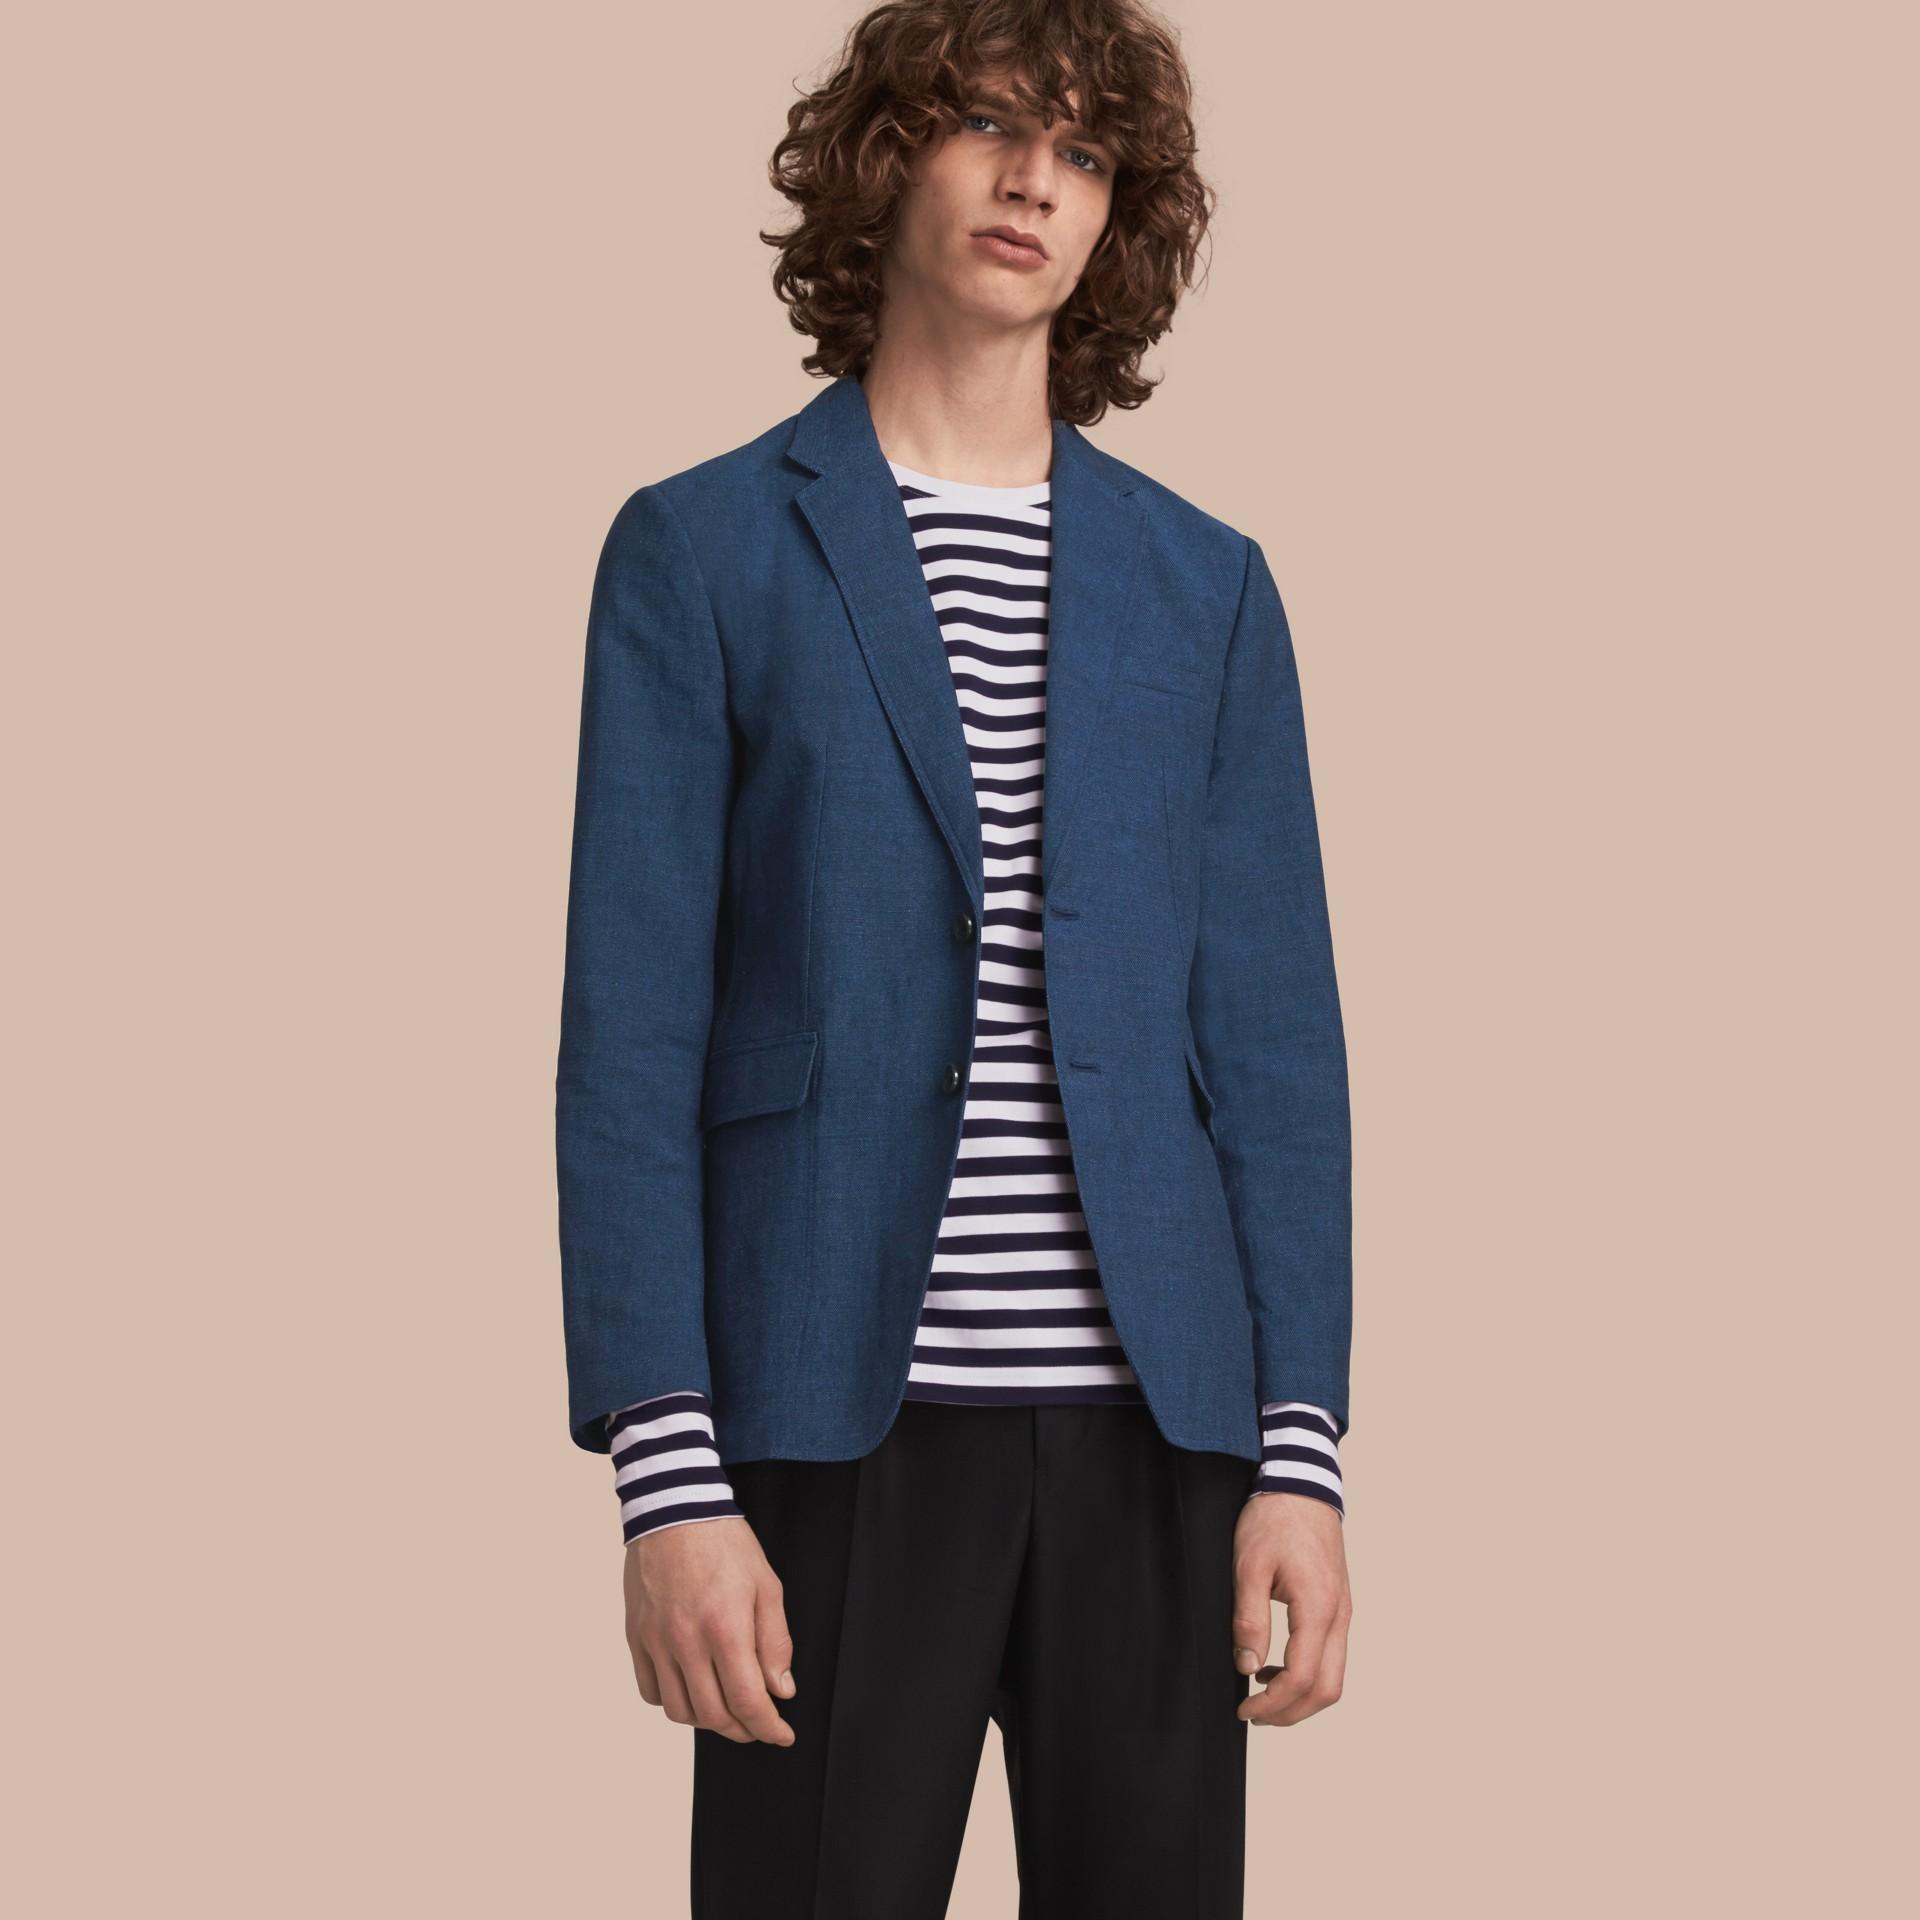 Lightweight Cotton Linen Blazer in Bright Navy - Men | Burberry - gallery image 1